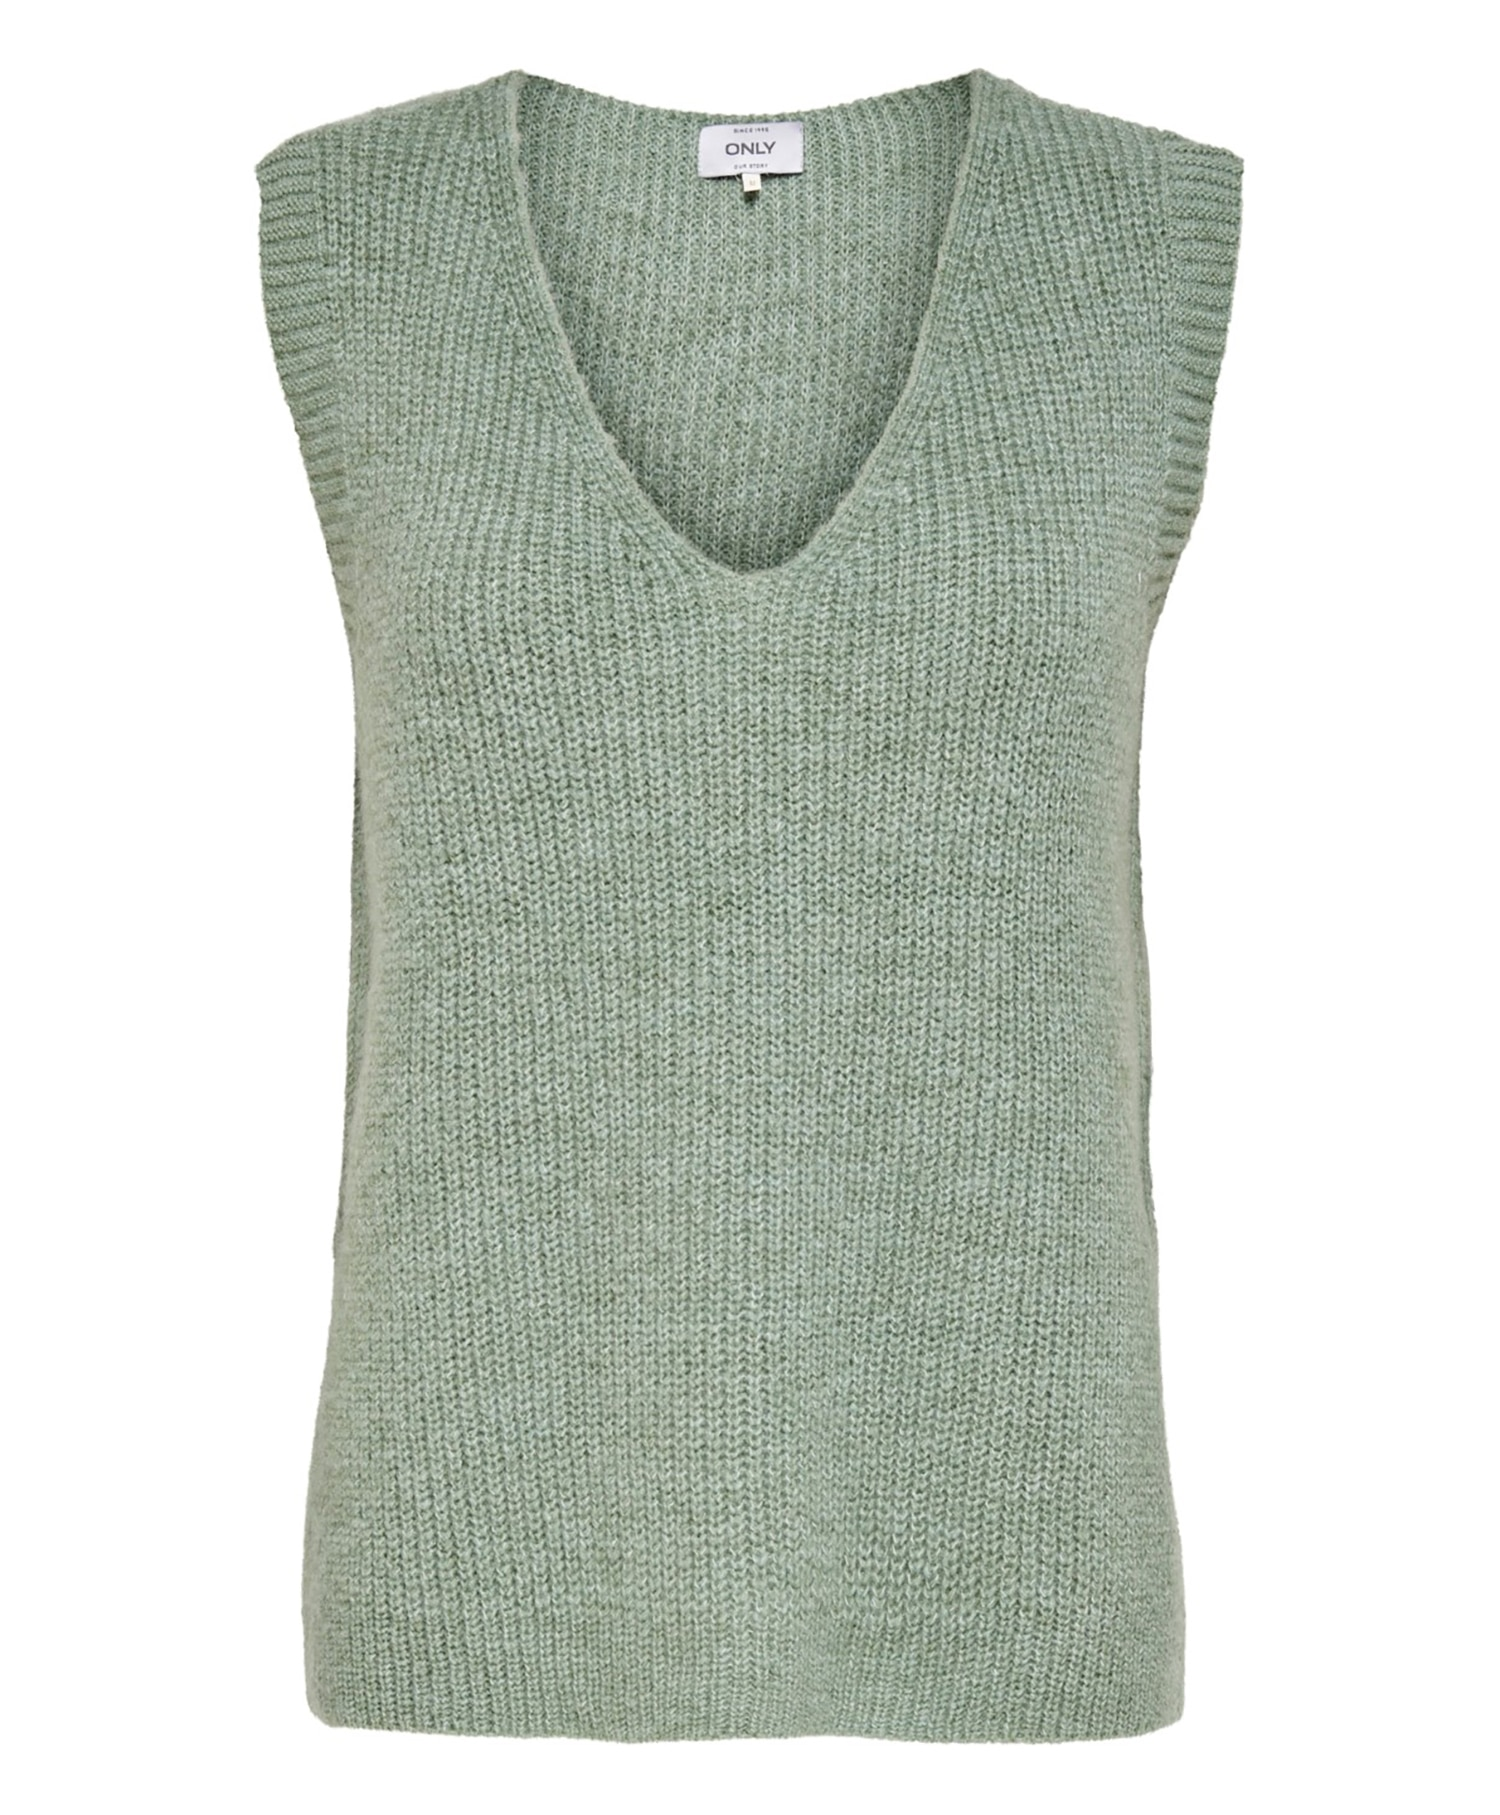 Only Cora Vest